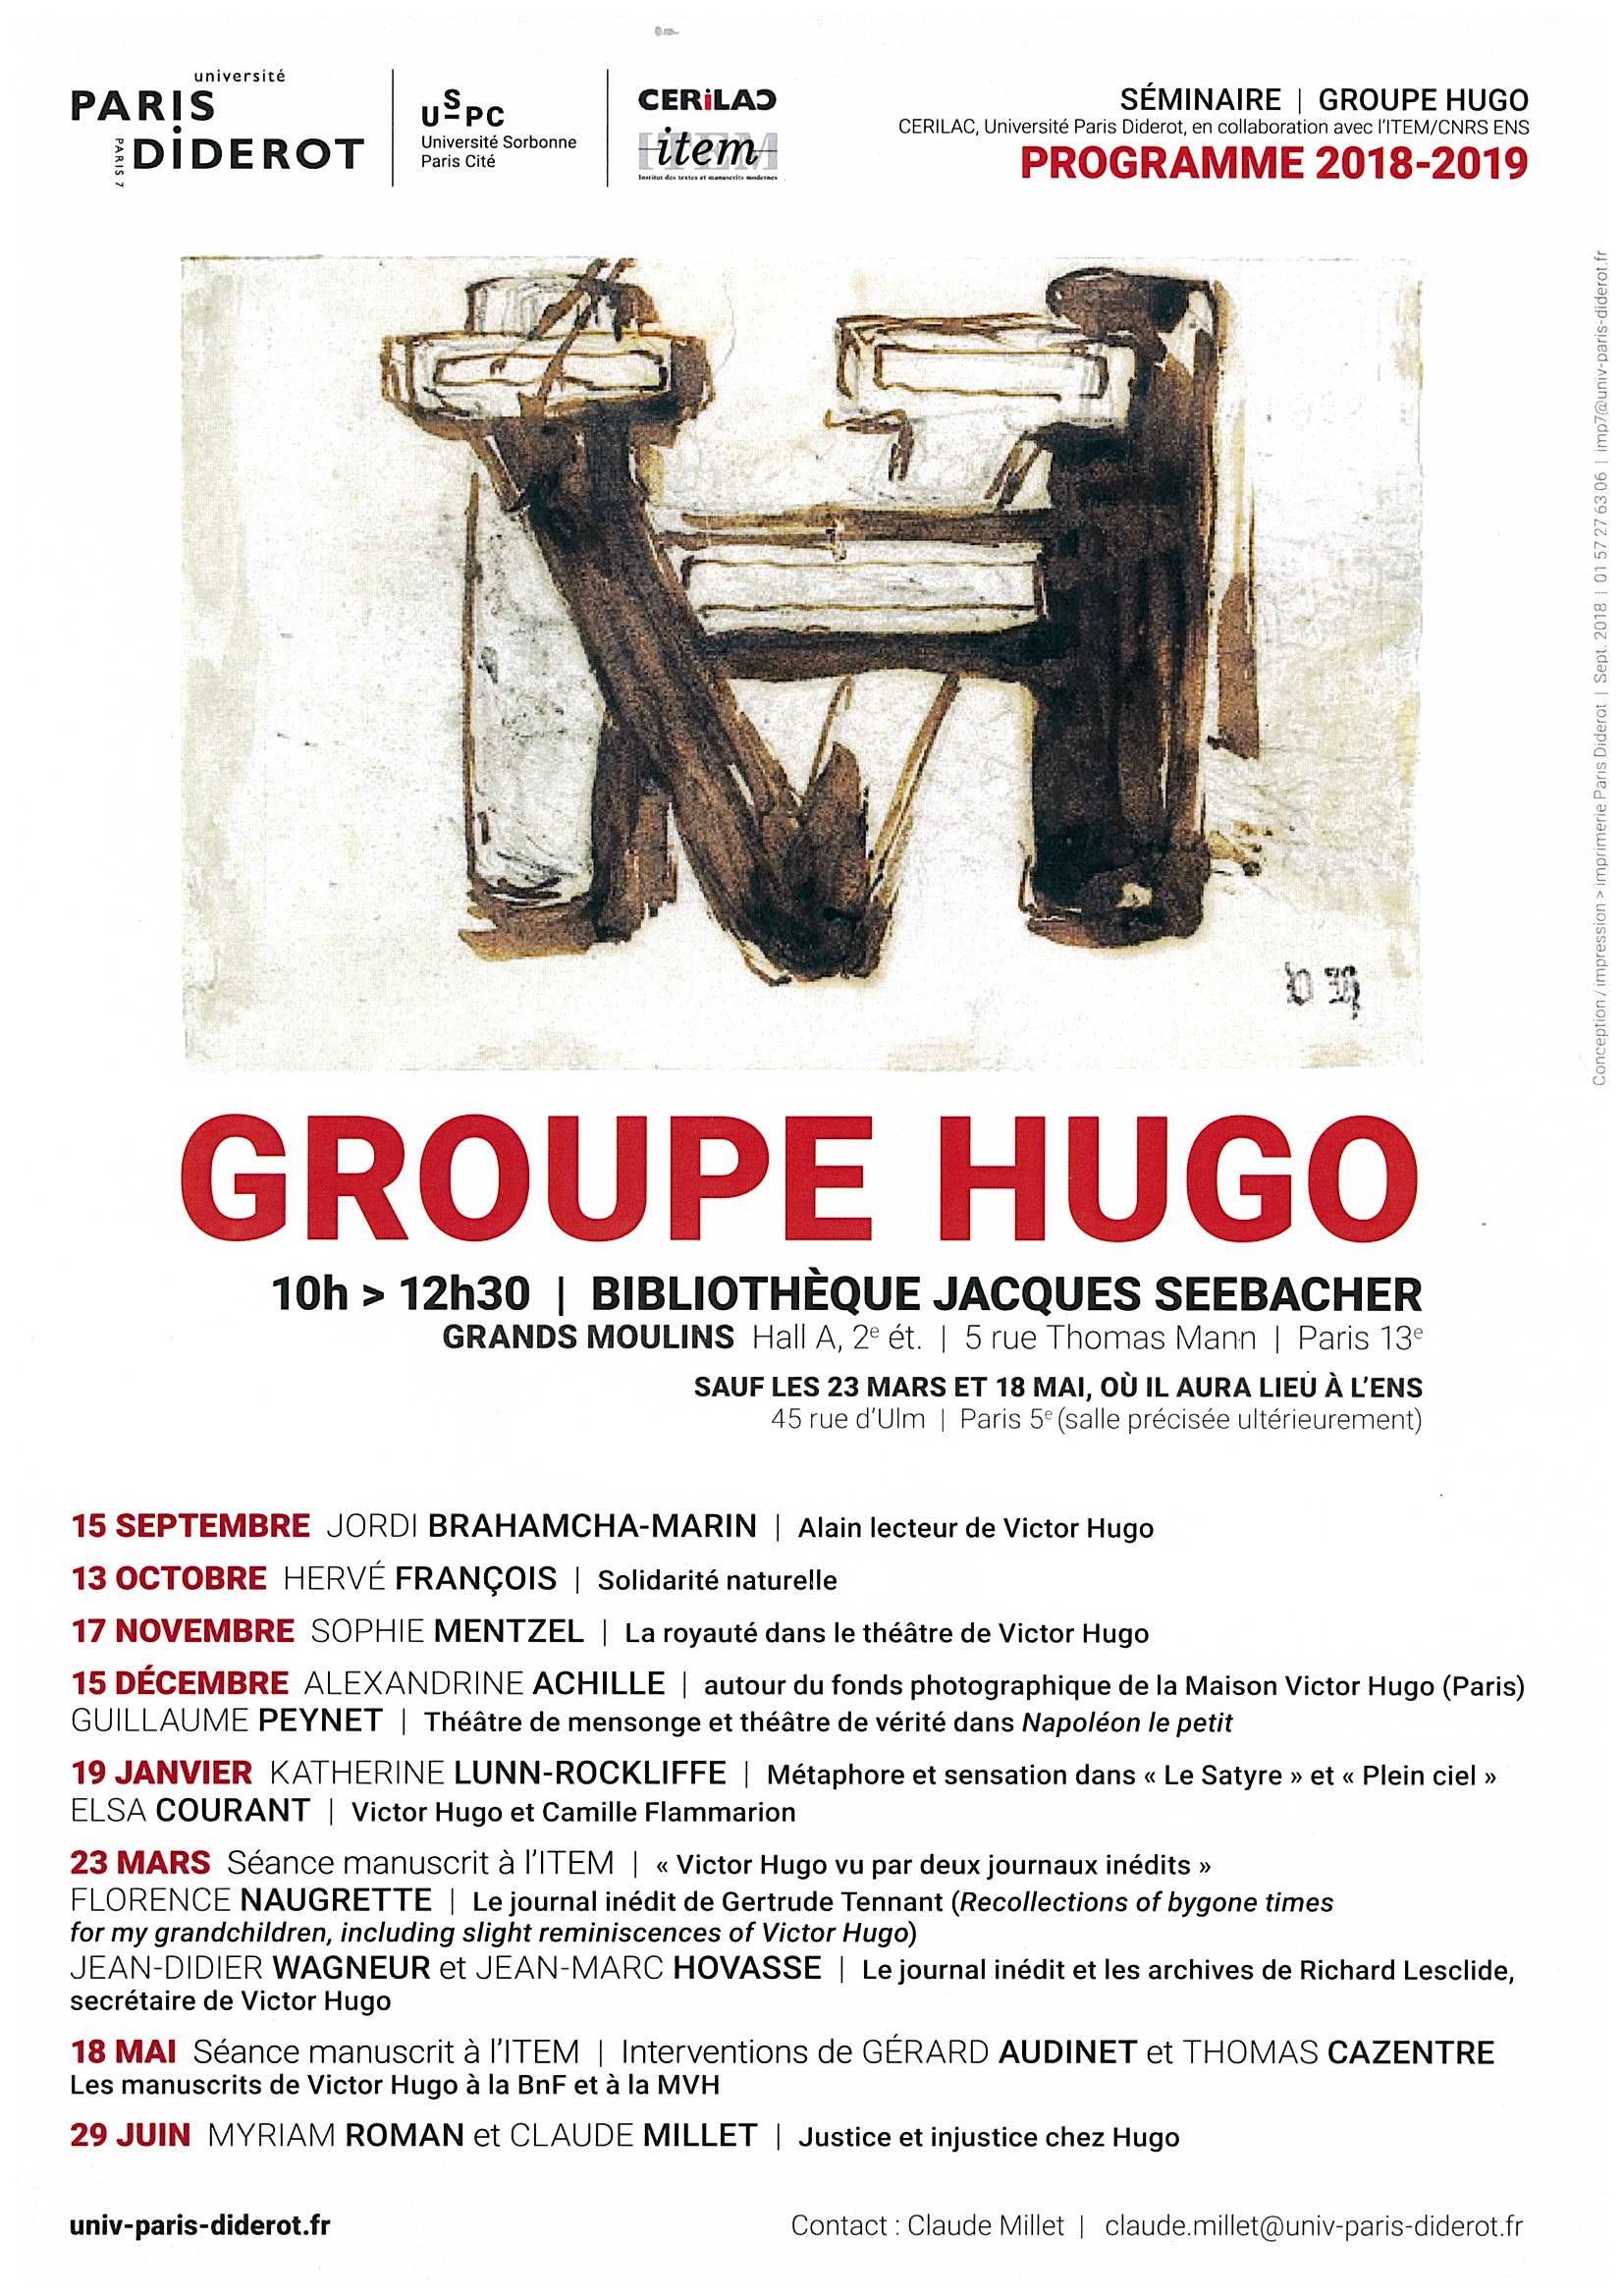 programme groupe hugo 2018-2019